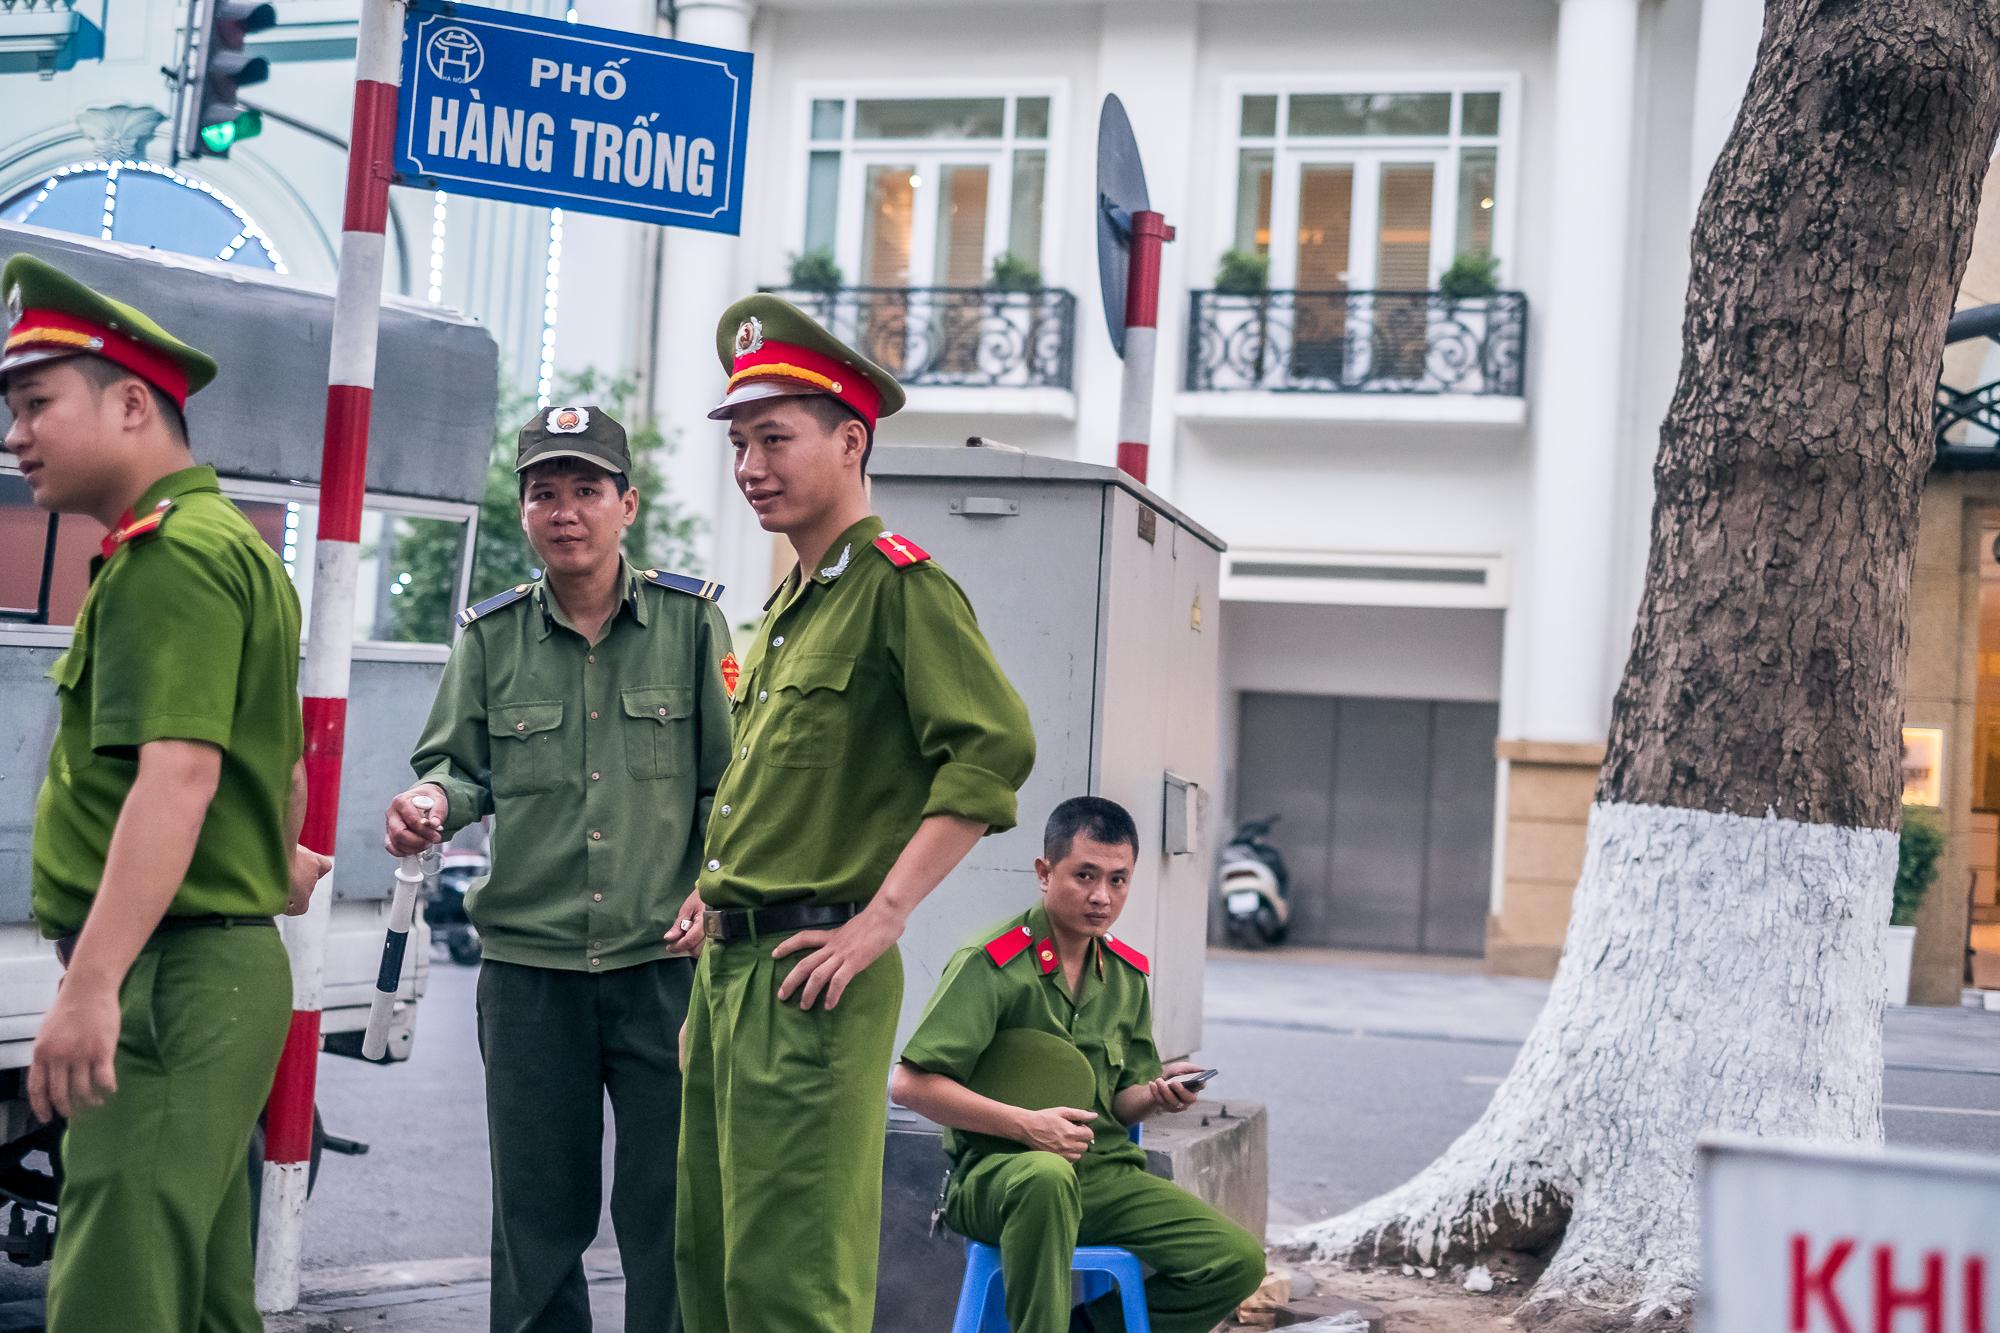 Vietnam_Honeymoon_TheOutsiderBlog_DSCF8137.JPG